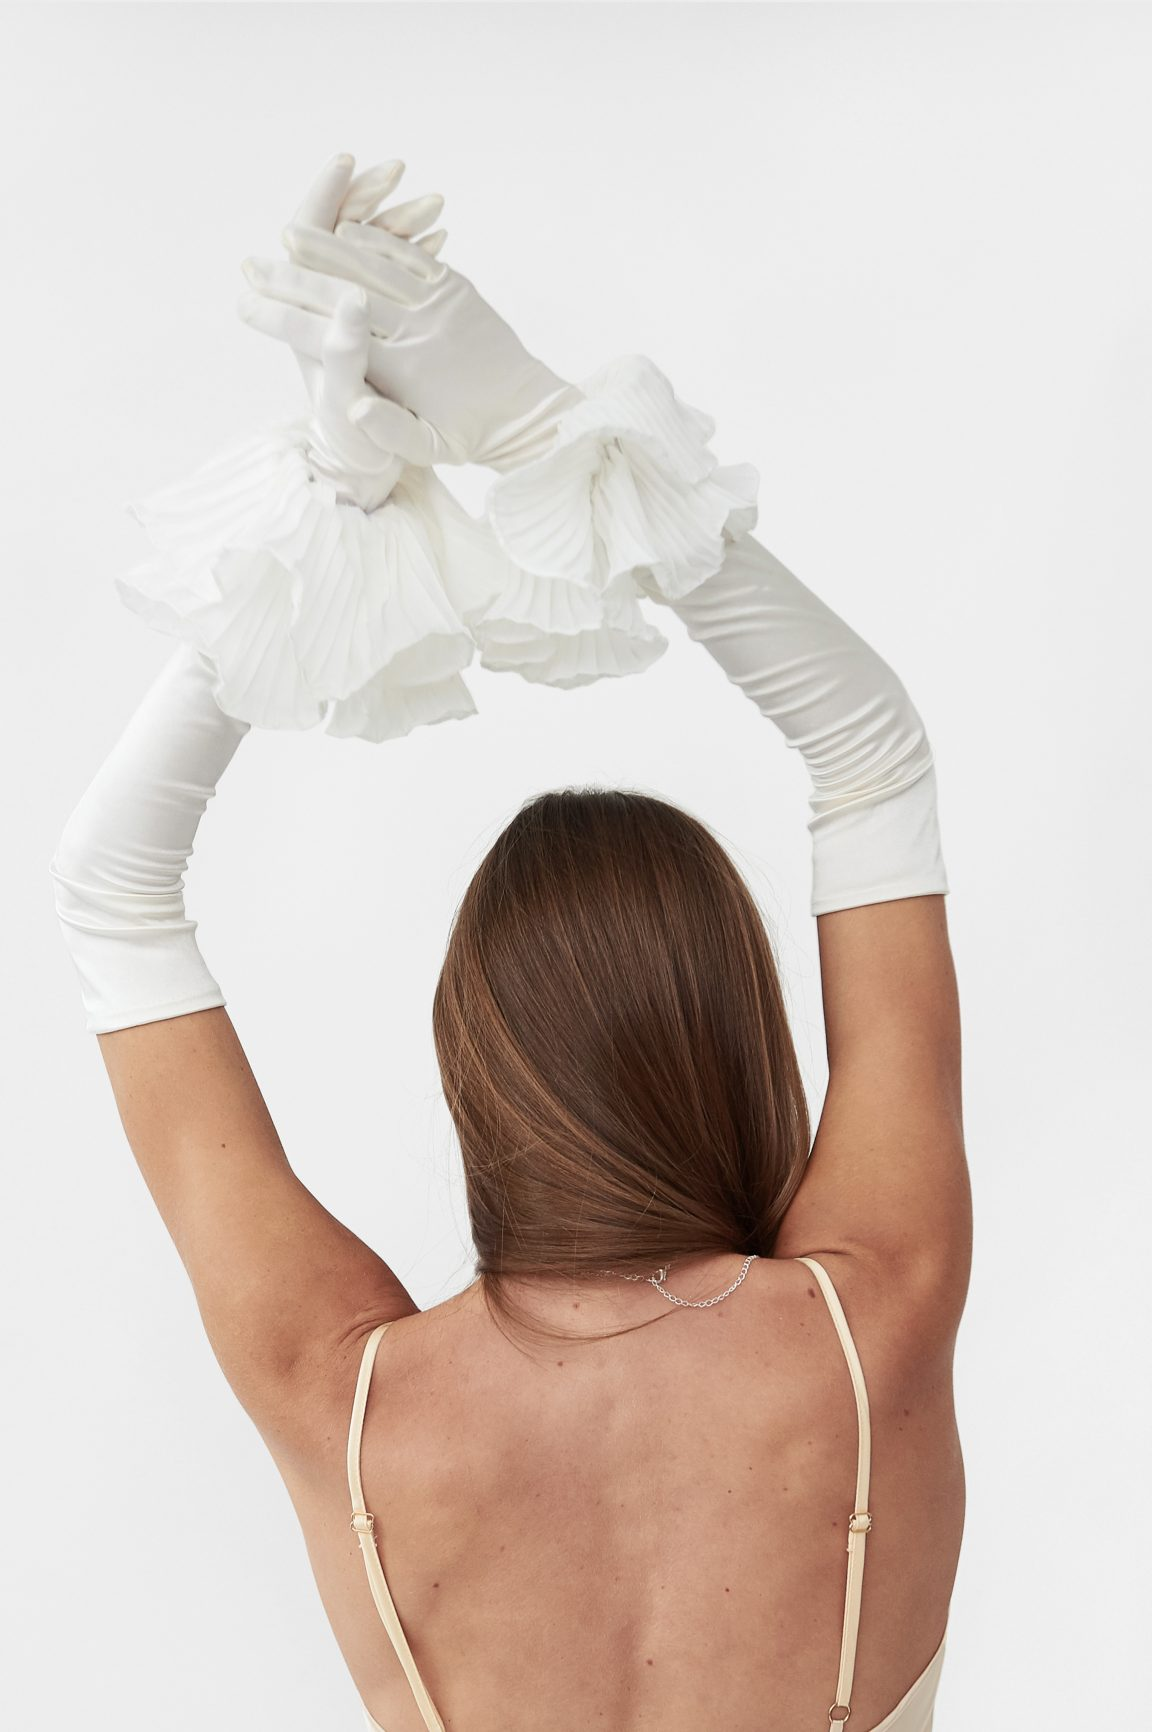 Long Satin Opera Gloves Inspired by Bridgerton